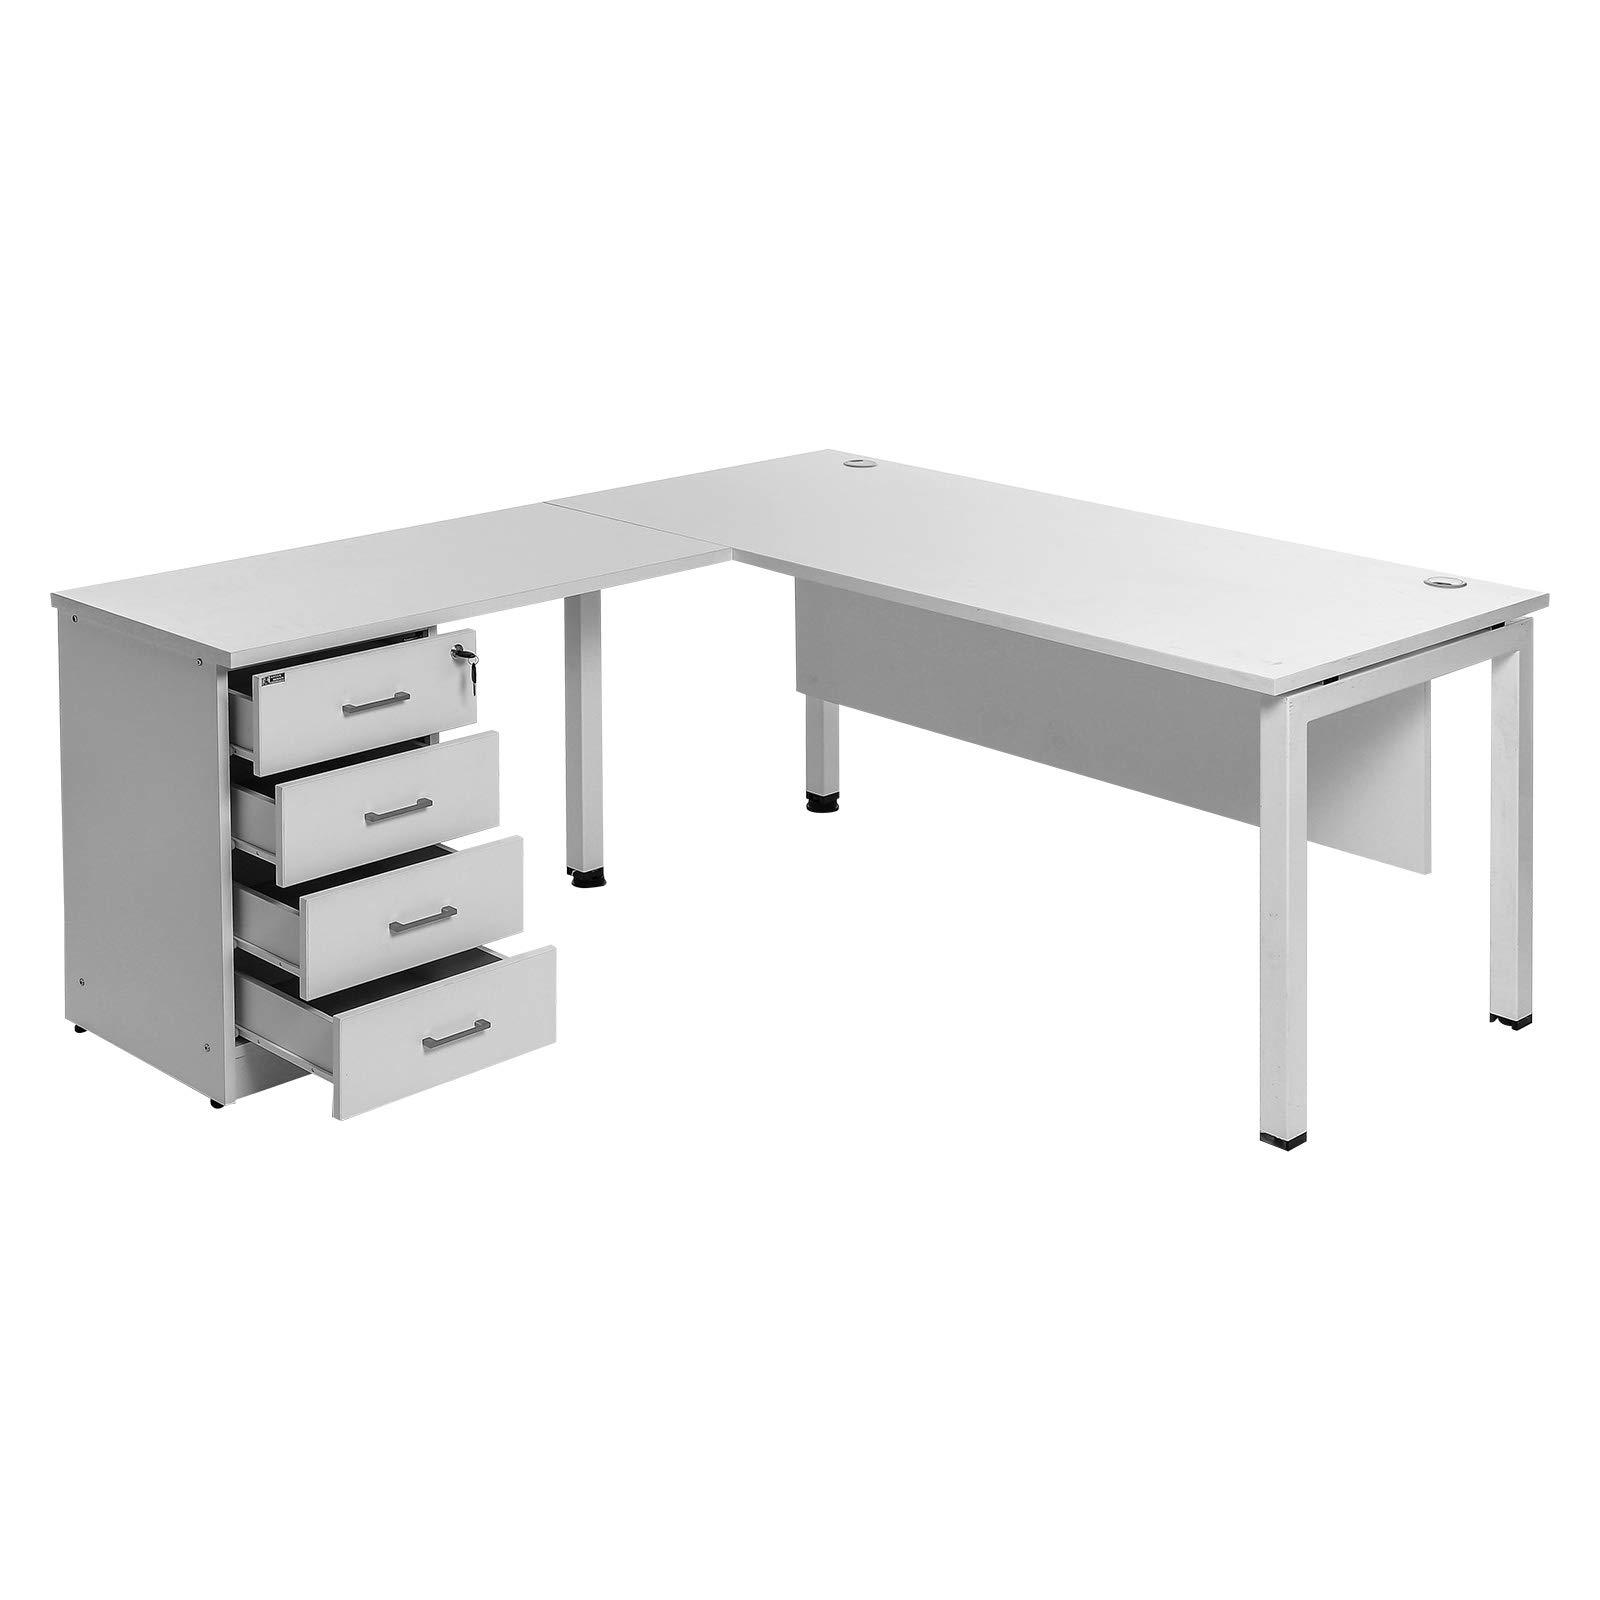 Artak Design L Shape Desk White 160 X 175 Cm Buy Online At Best Price In Uae Amazon Ae